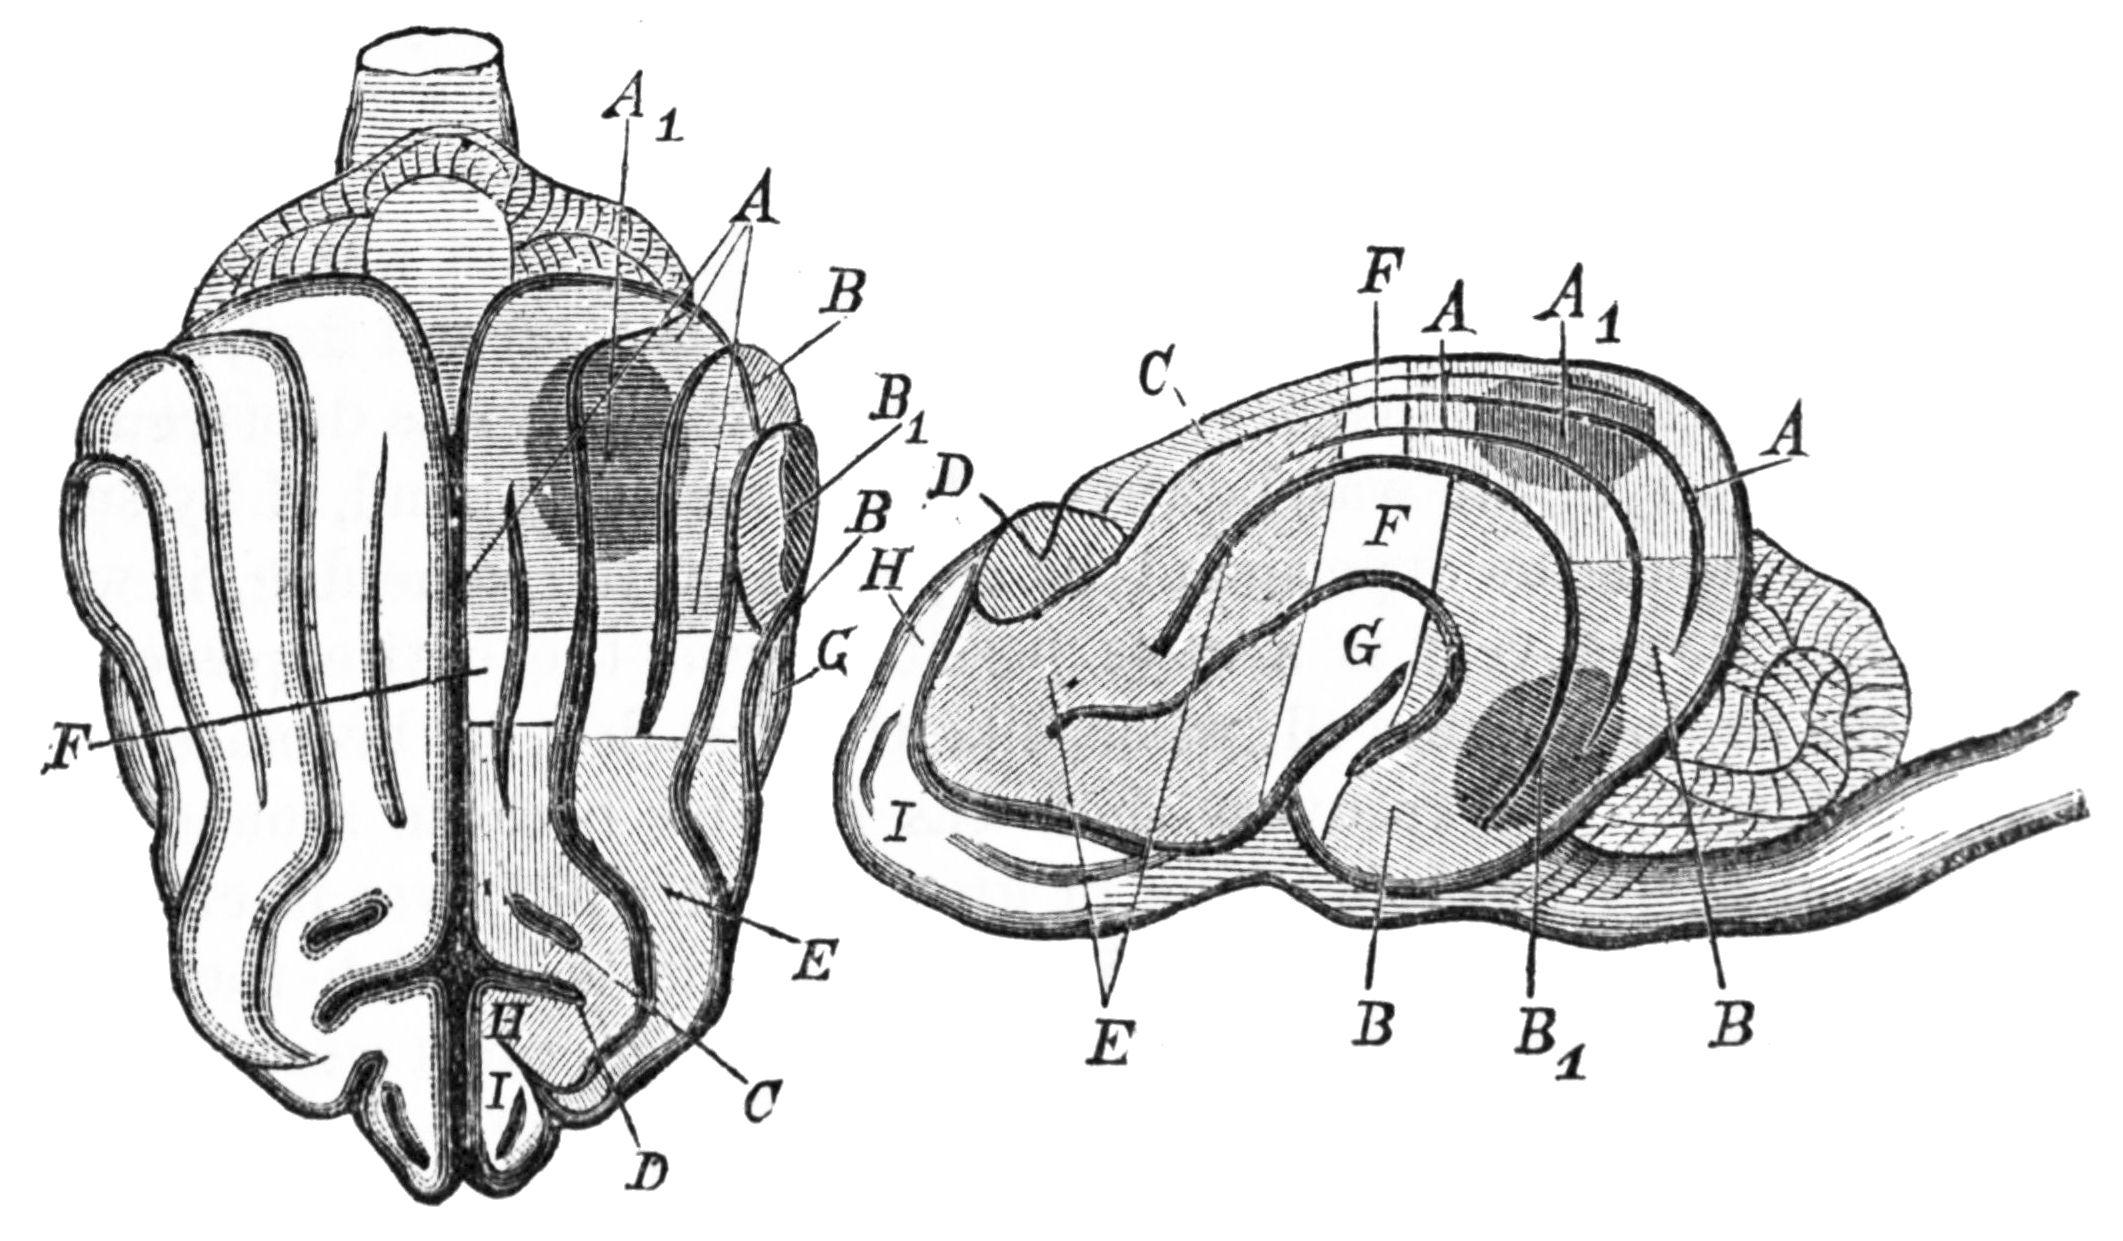 Description psm v25 d628 brain of a dog and diagram of munk